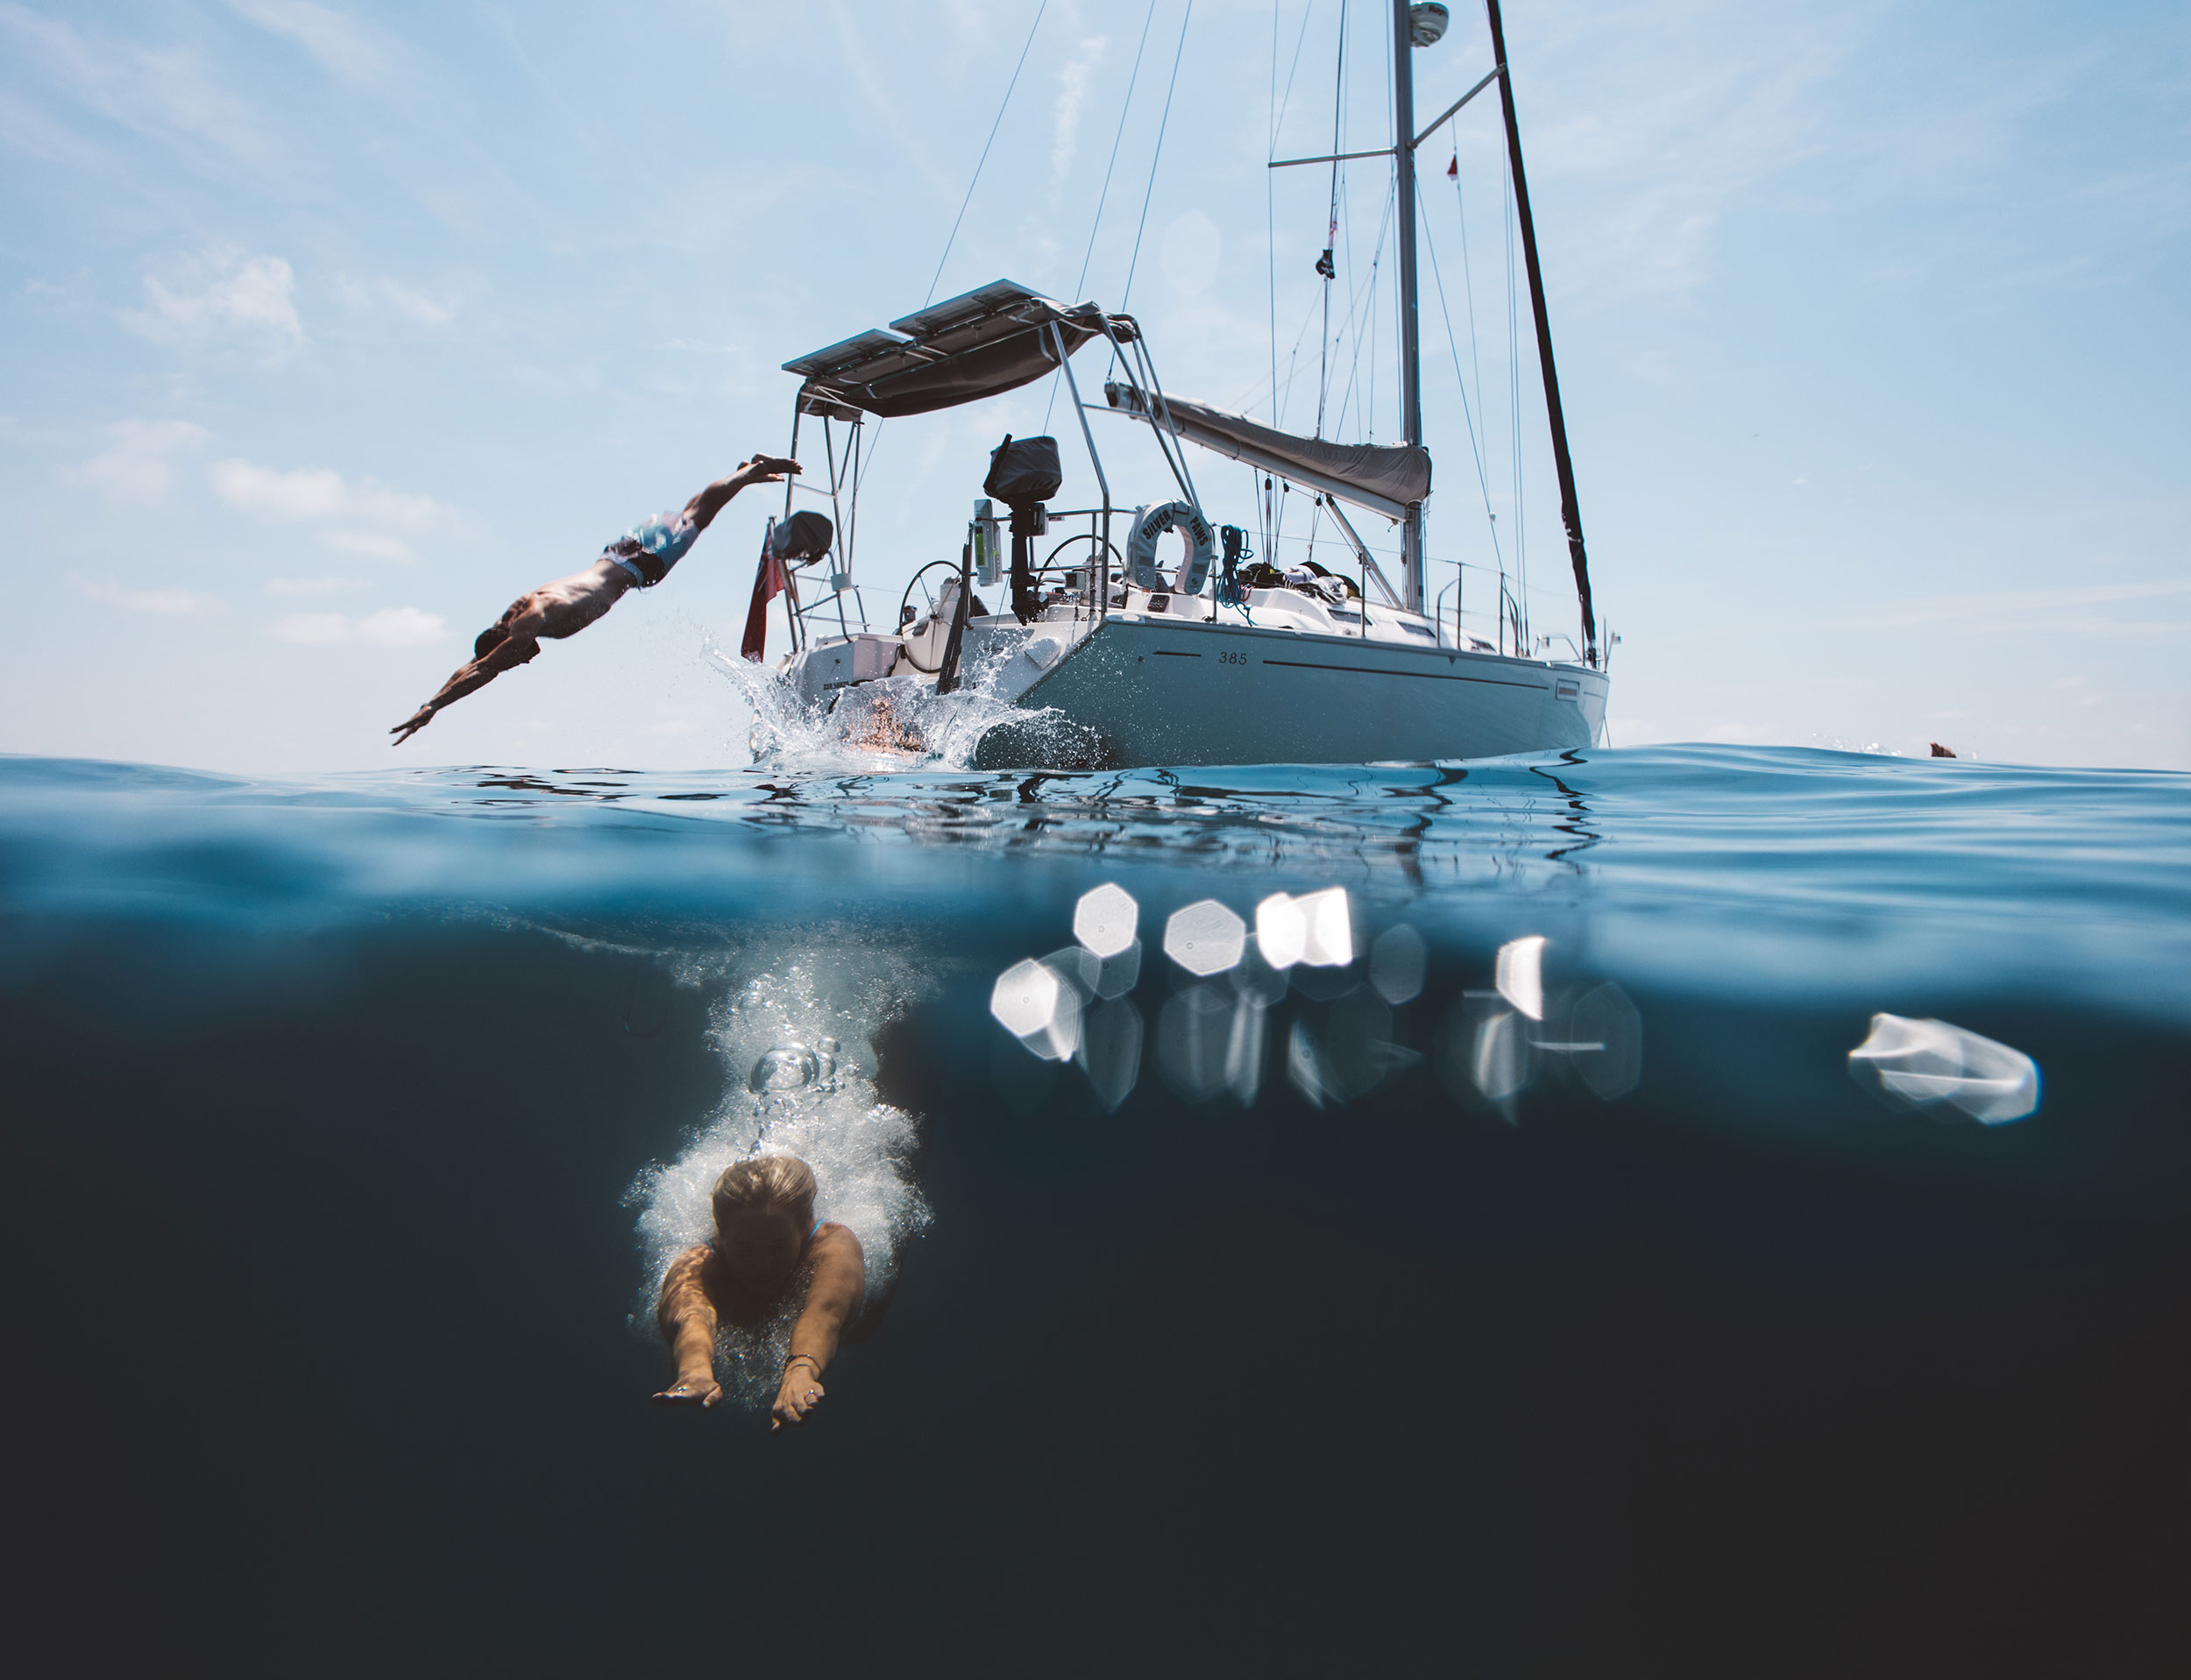 Matt-Porteous_Yachtlife-(2)-(1).jpg